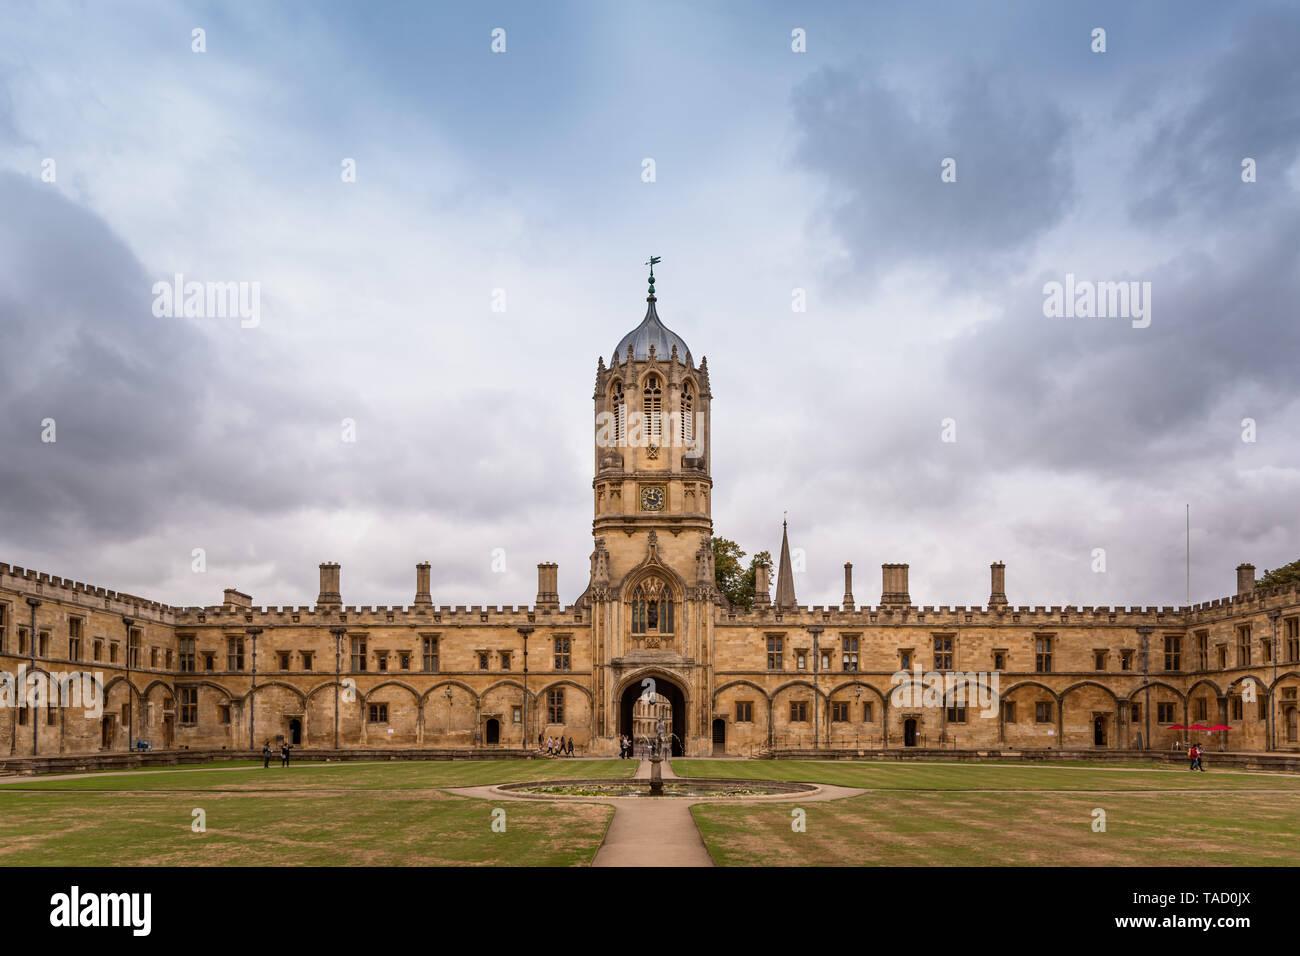 Tom Tower, Christ Church, Oxford University, UK - Stock Image